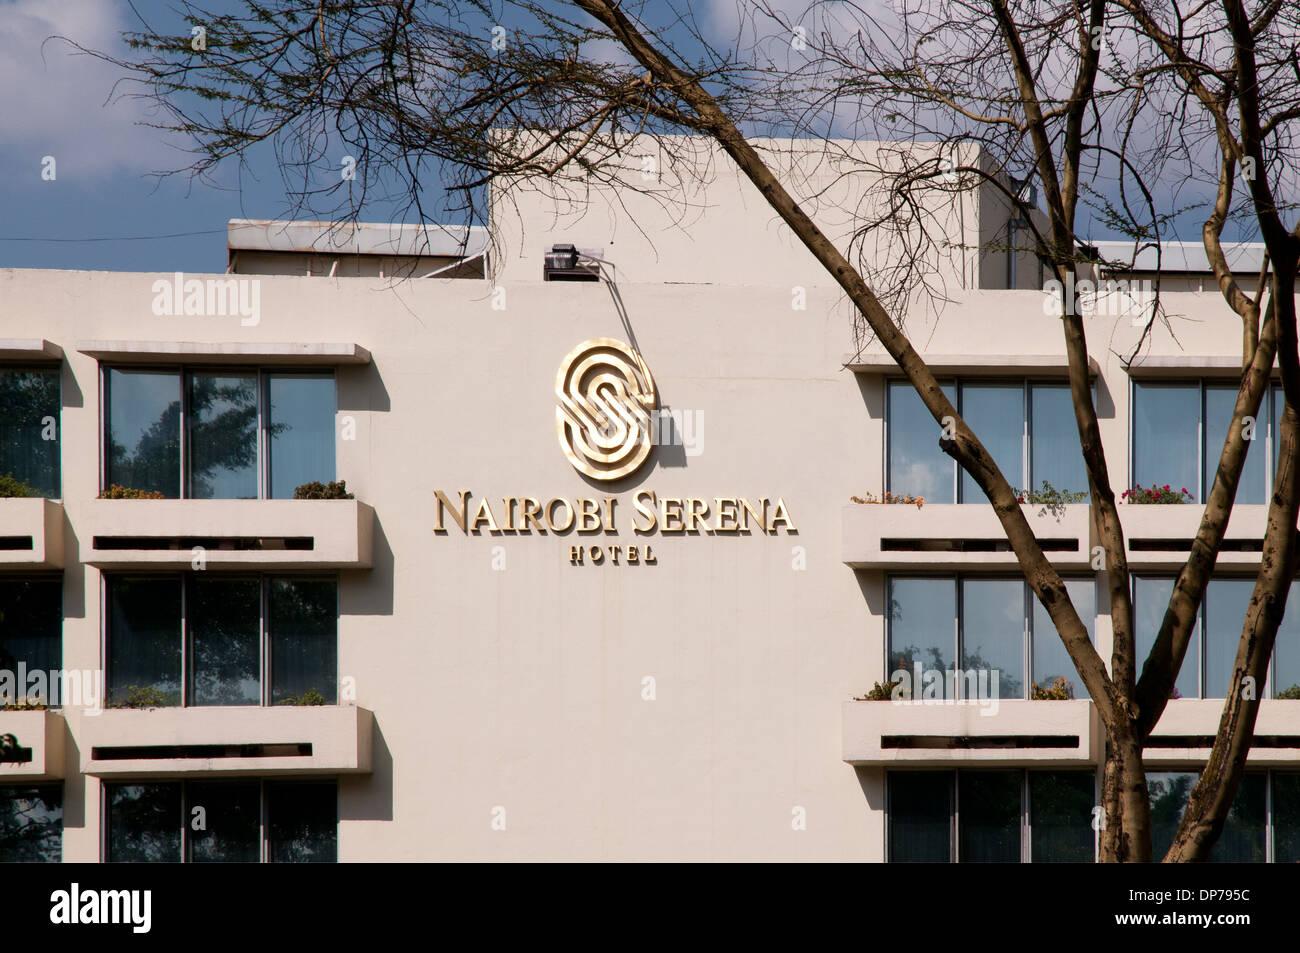 Logo on exterior of Nairobi Serena Hotel Nairobi Kenya Africa - Stock Image